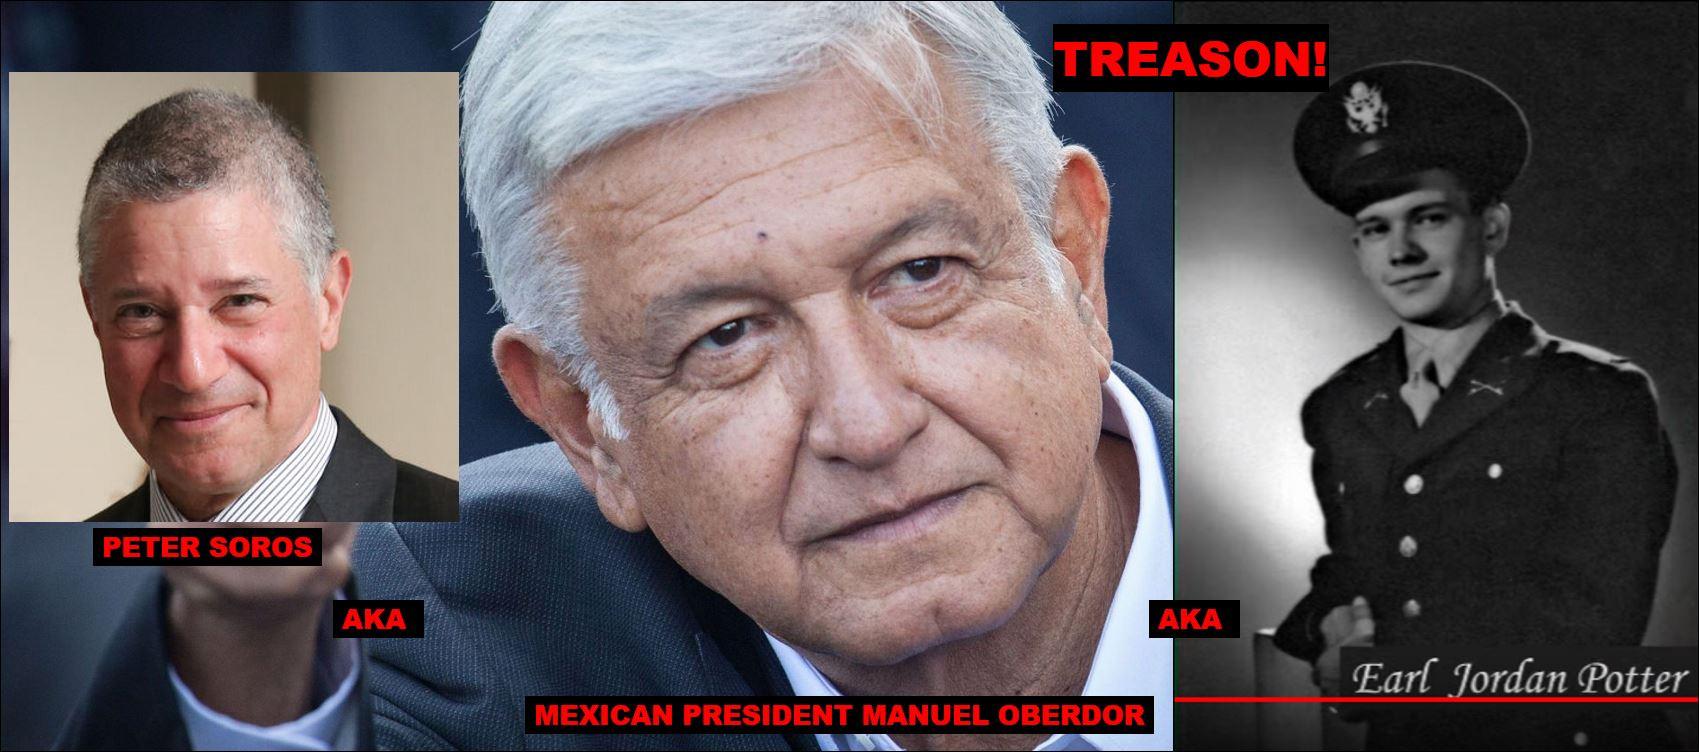 PETER SOROS AKA MEXICAN PRESIDENT OBERDO